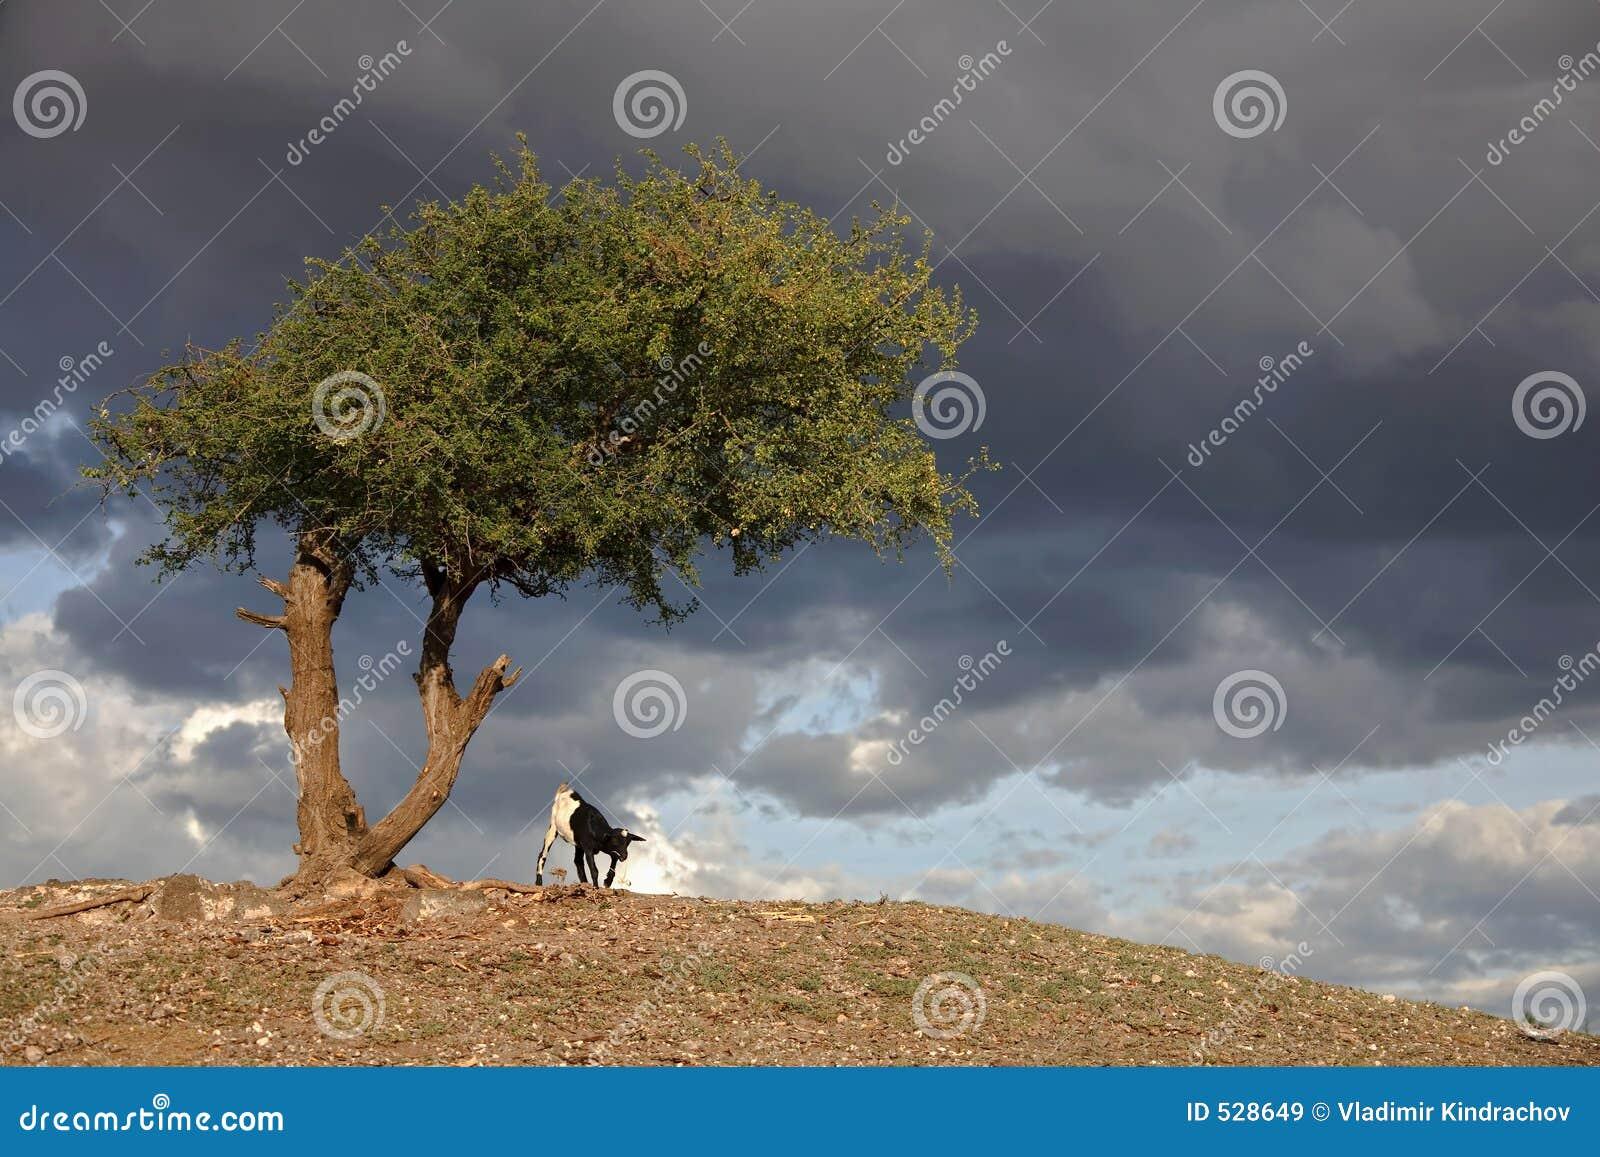 Download 030非洲横向serengeti 库存图片. 图片 包括有 原野, 测试, 工厂, 肯尼亚, 天空, 结构树 - 528649